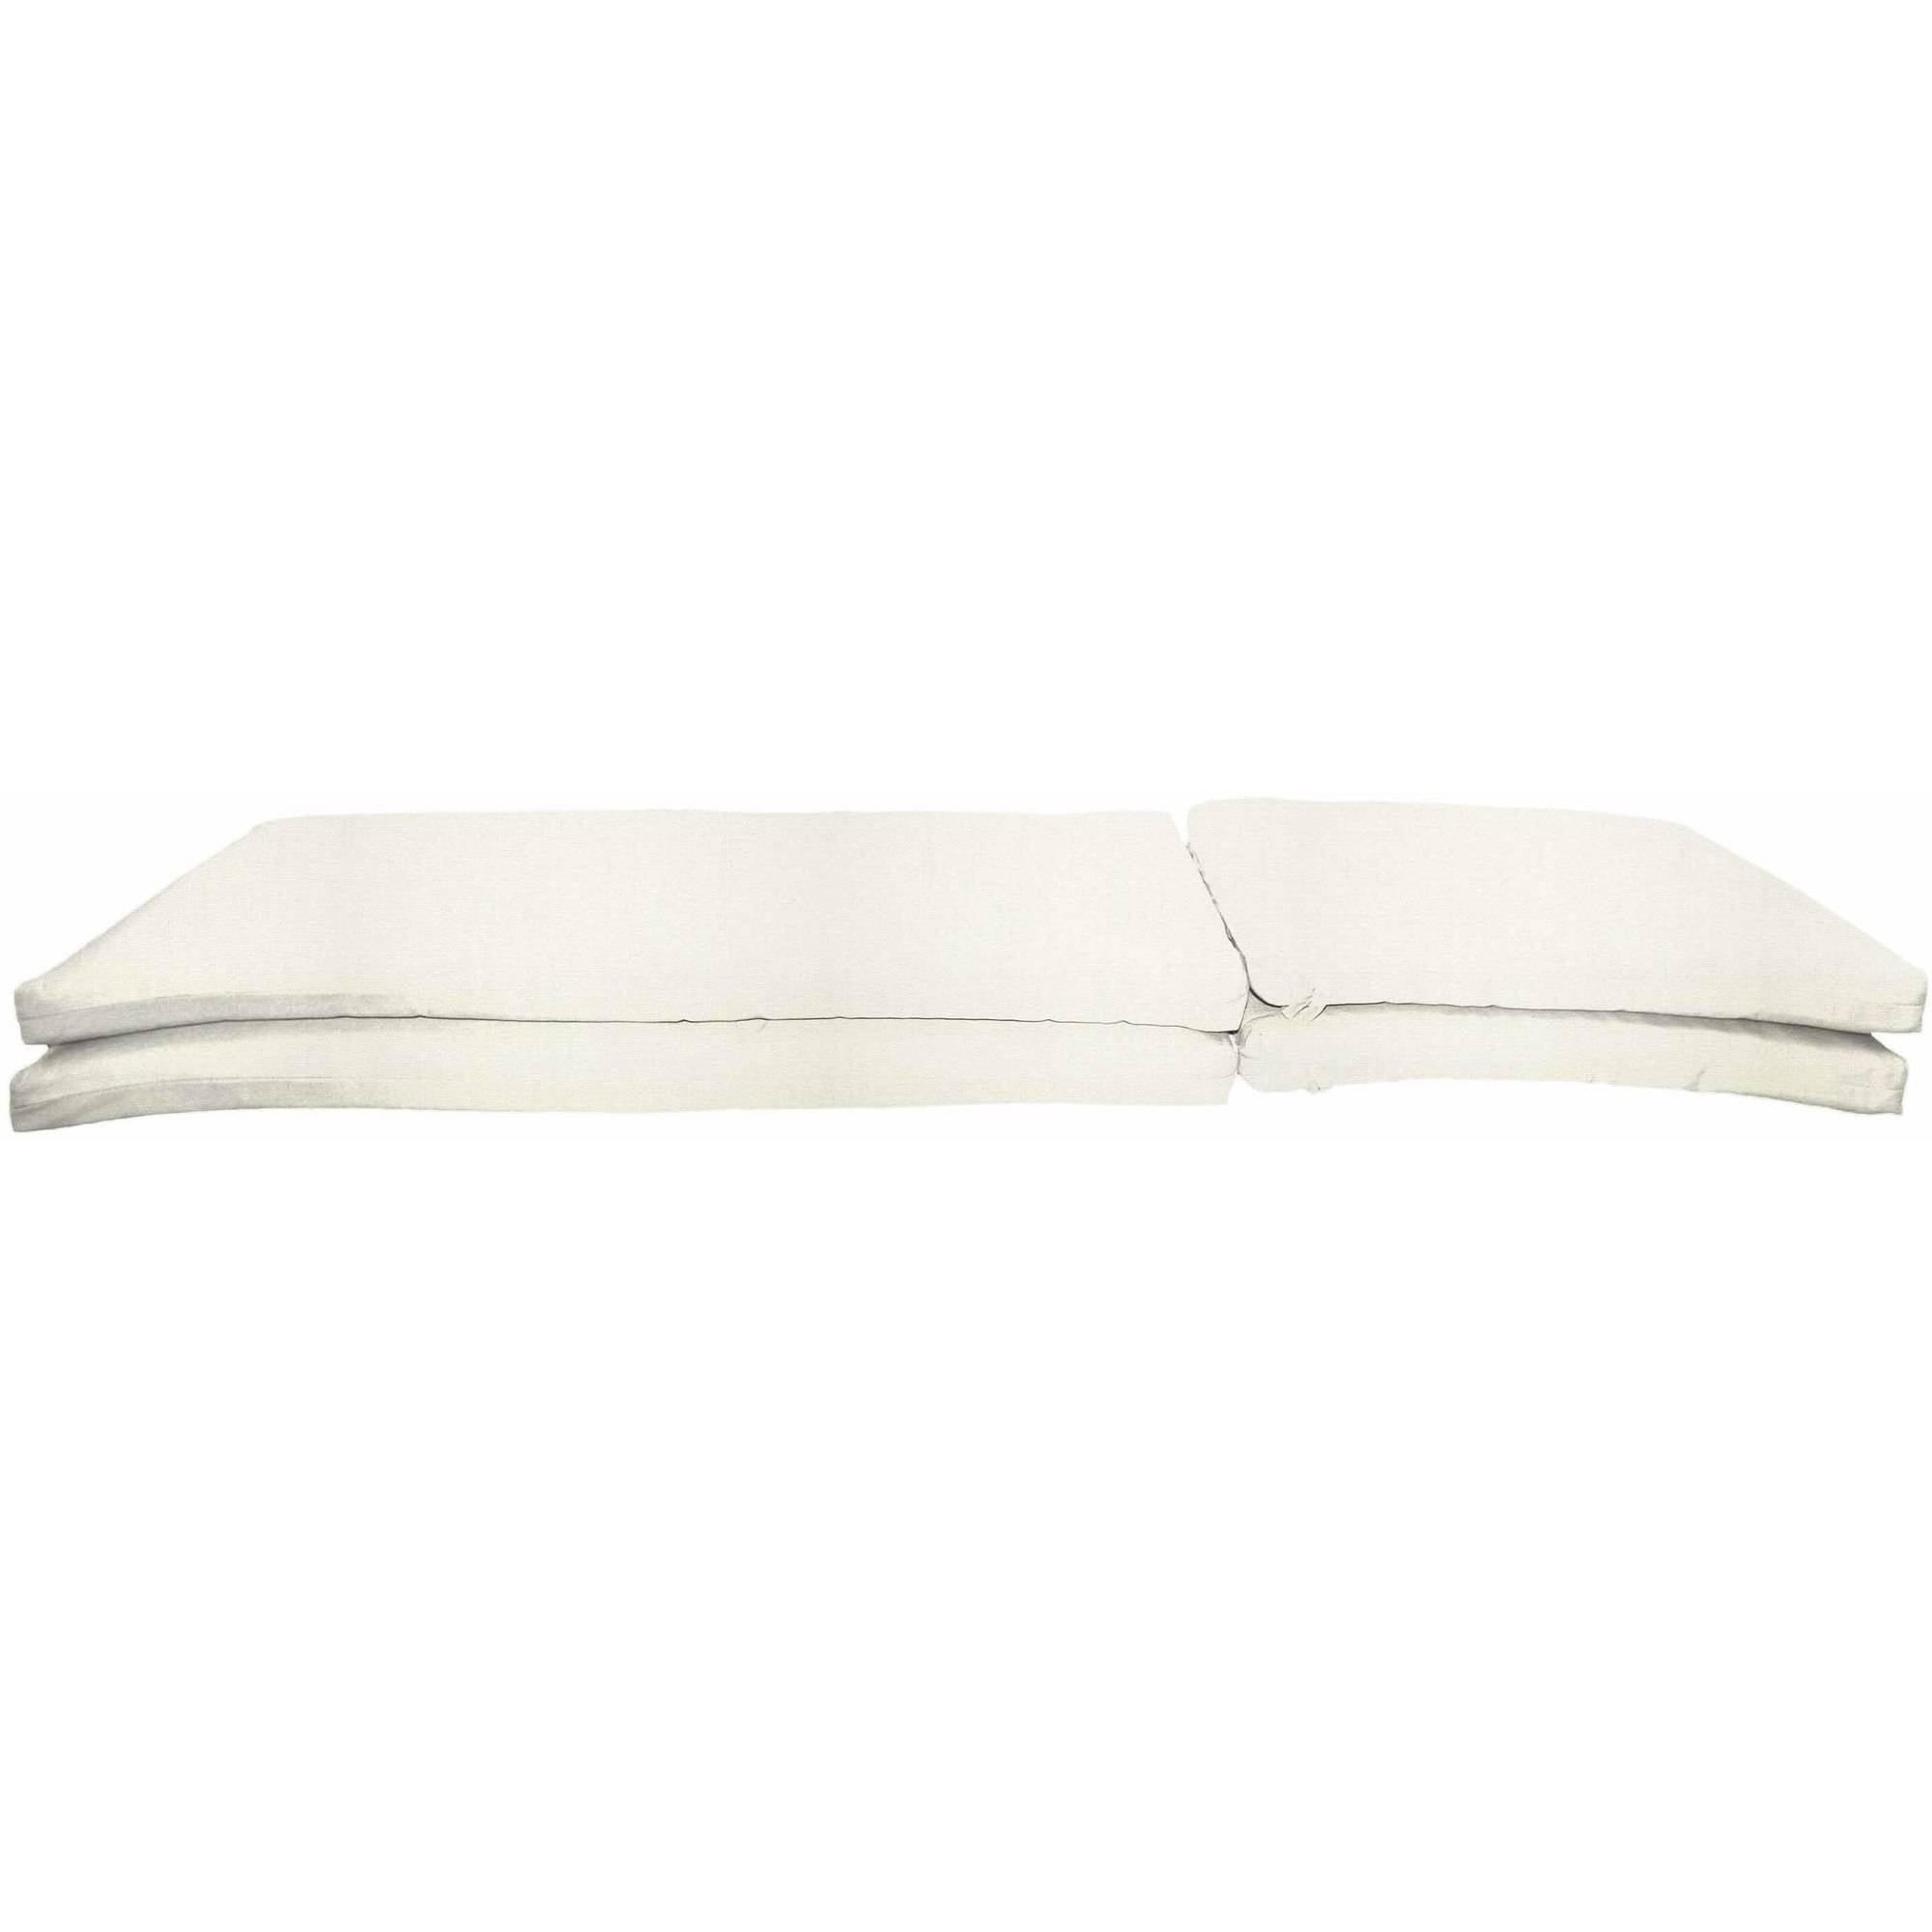 Sunbrella Designer Knife Edge Chaise Lounge Cushions, Set of 2